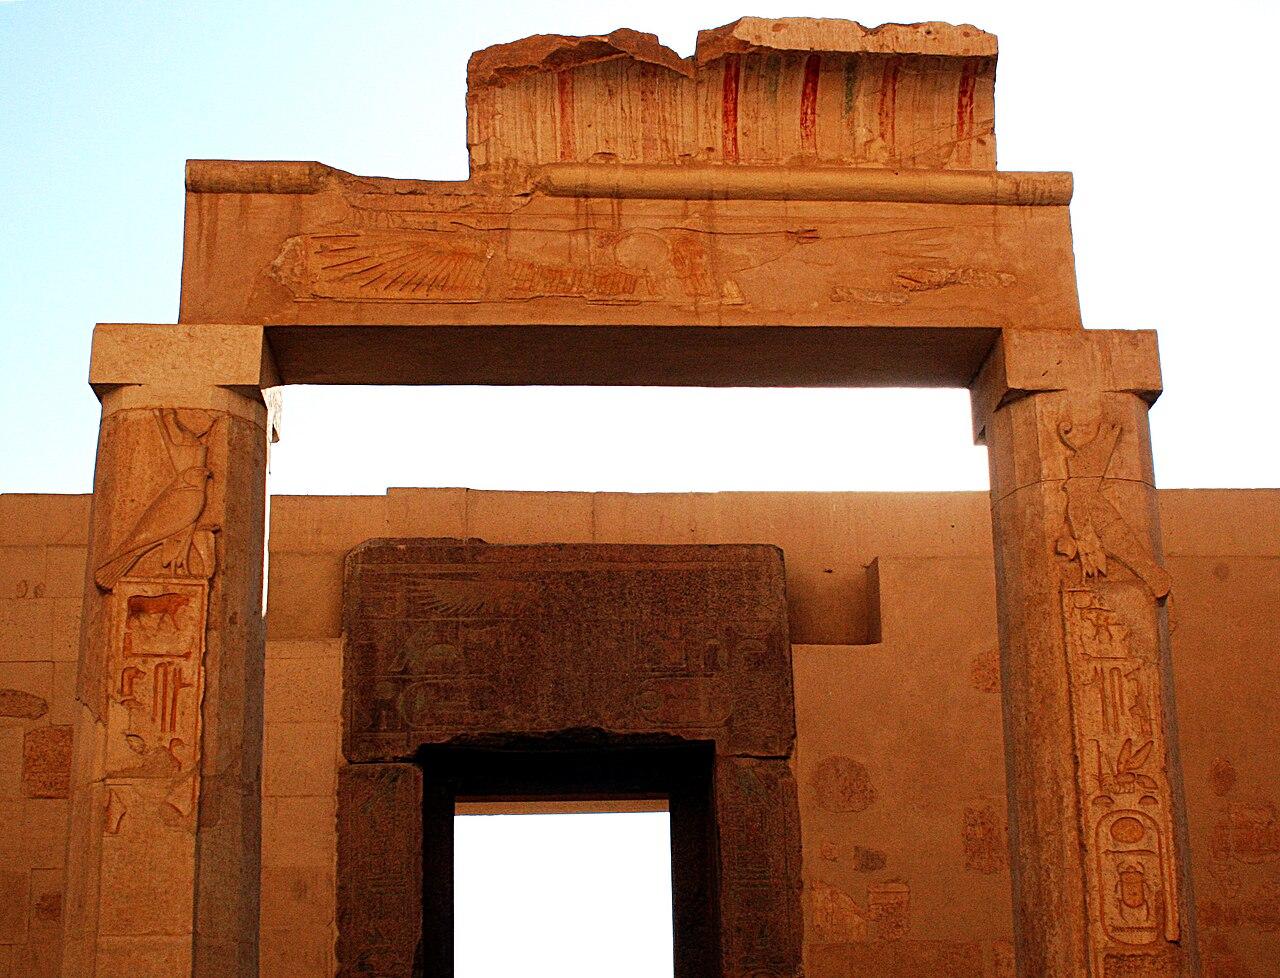 Horus behedety 1280px-Deir_el-Bahari_0516